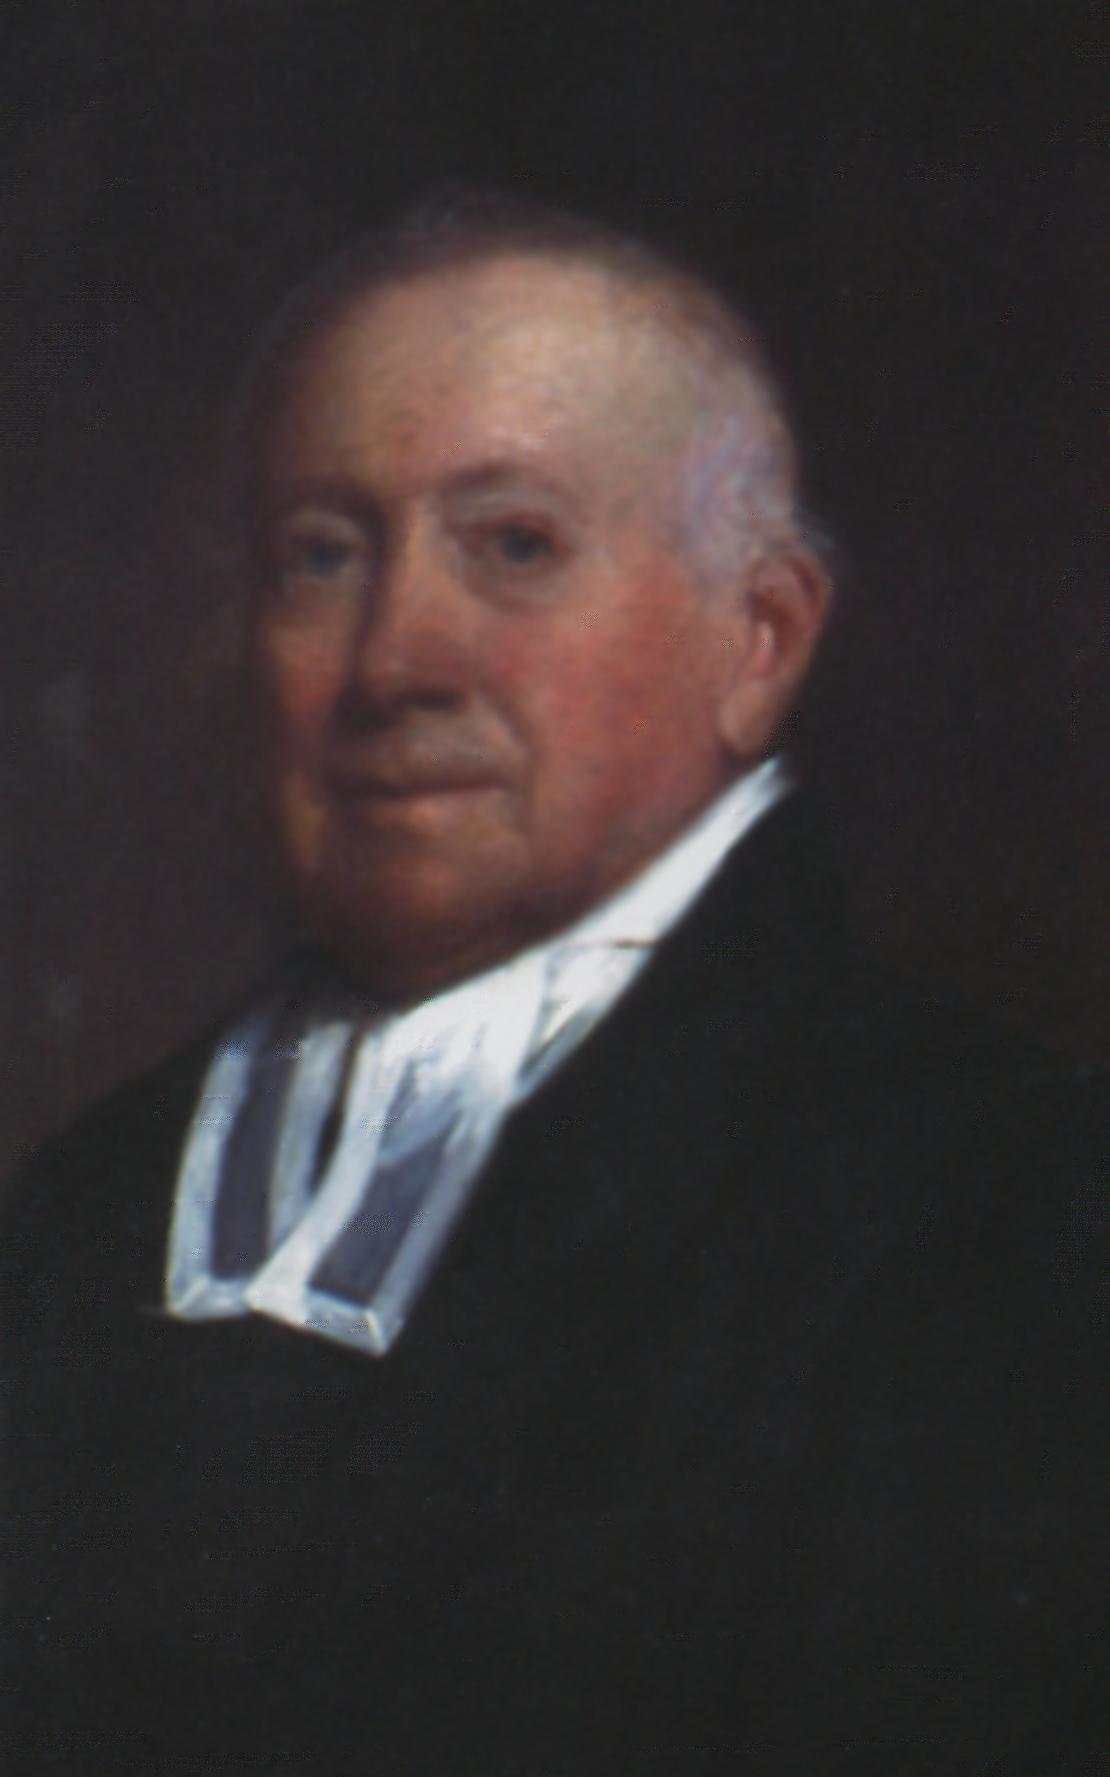 Manasseh Cutler Wikipedia